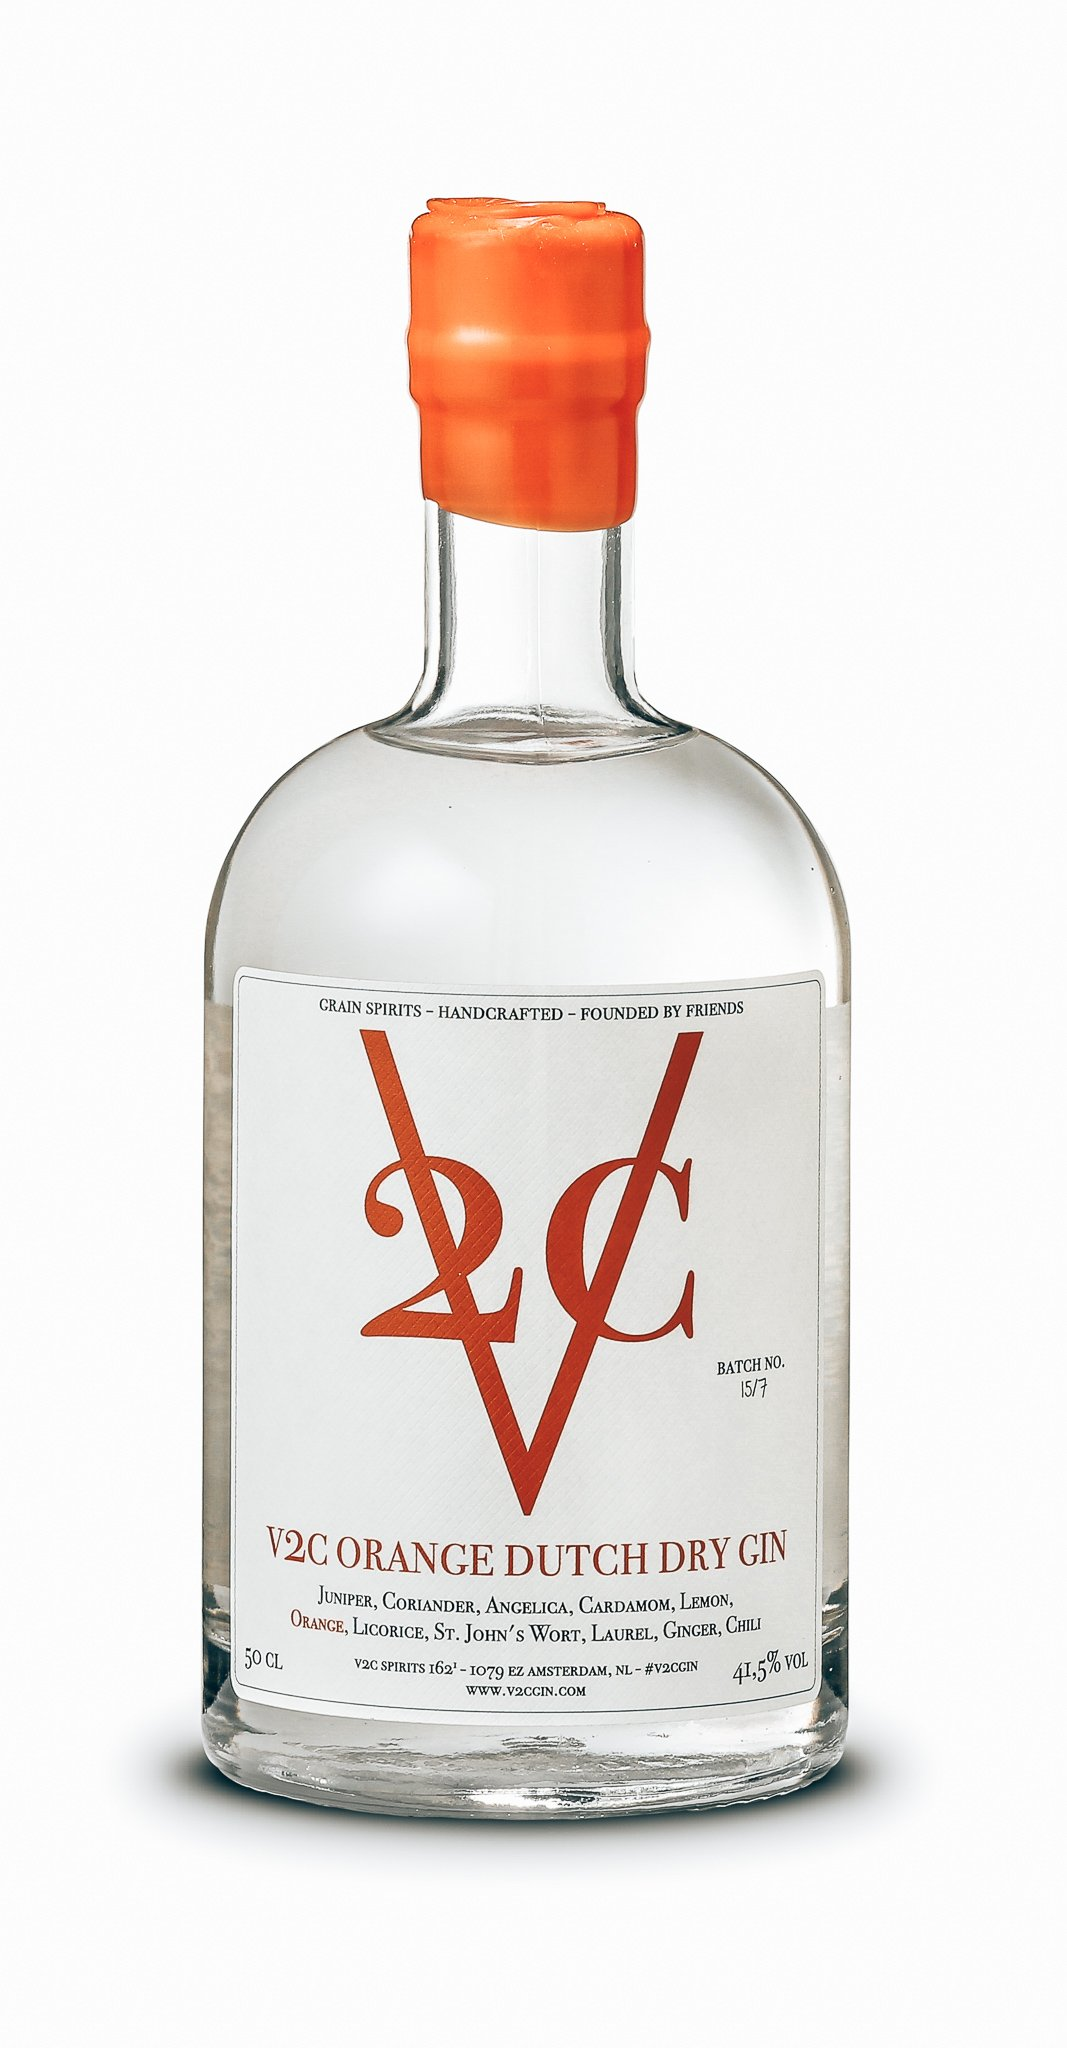 V2C Orange Dutch Dry Gin, Amsterdam, Alles over gin.